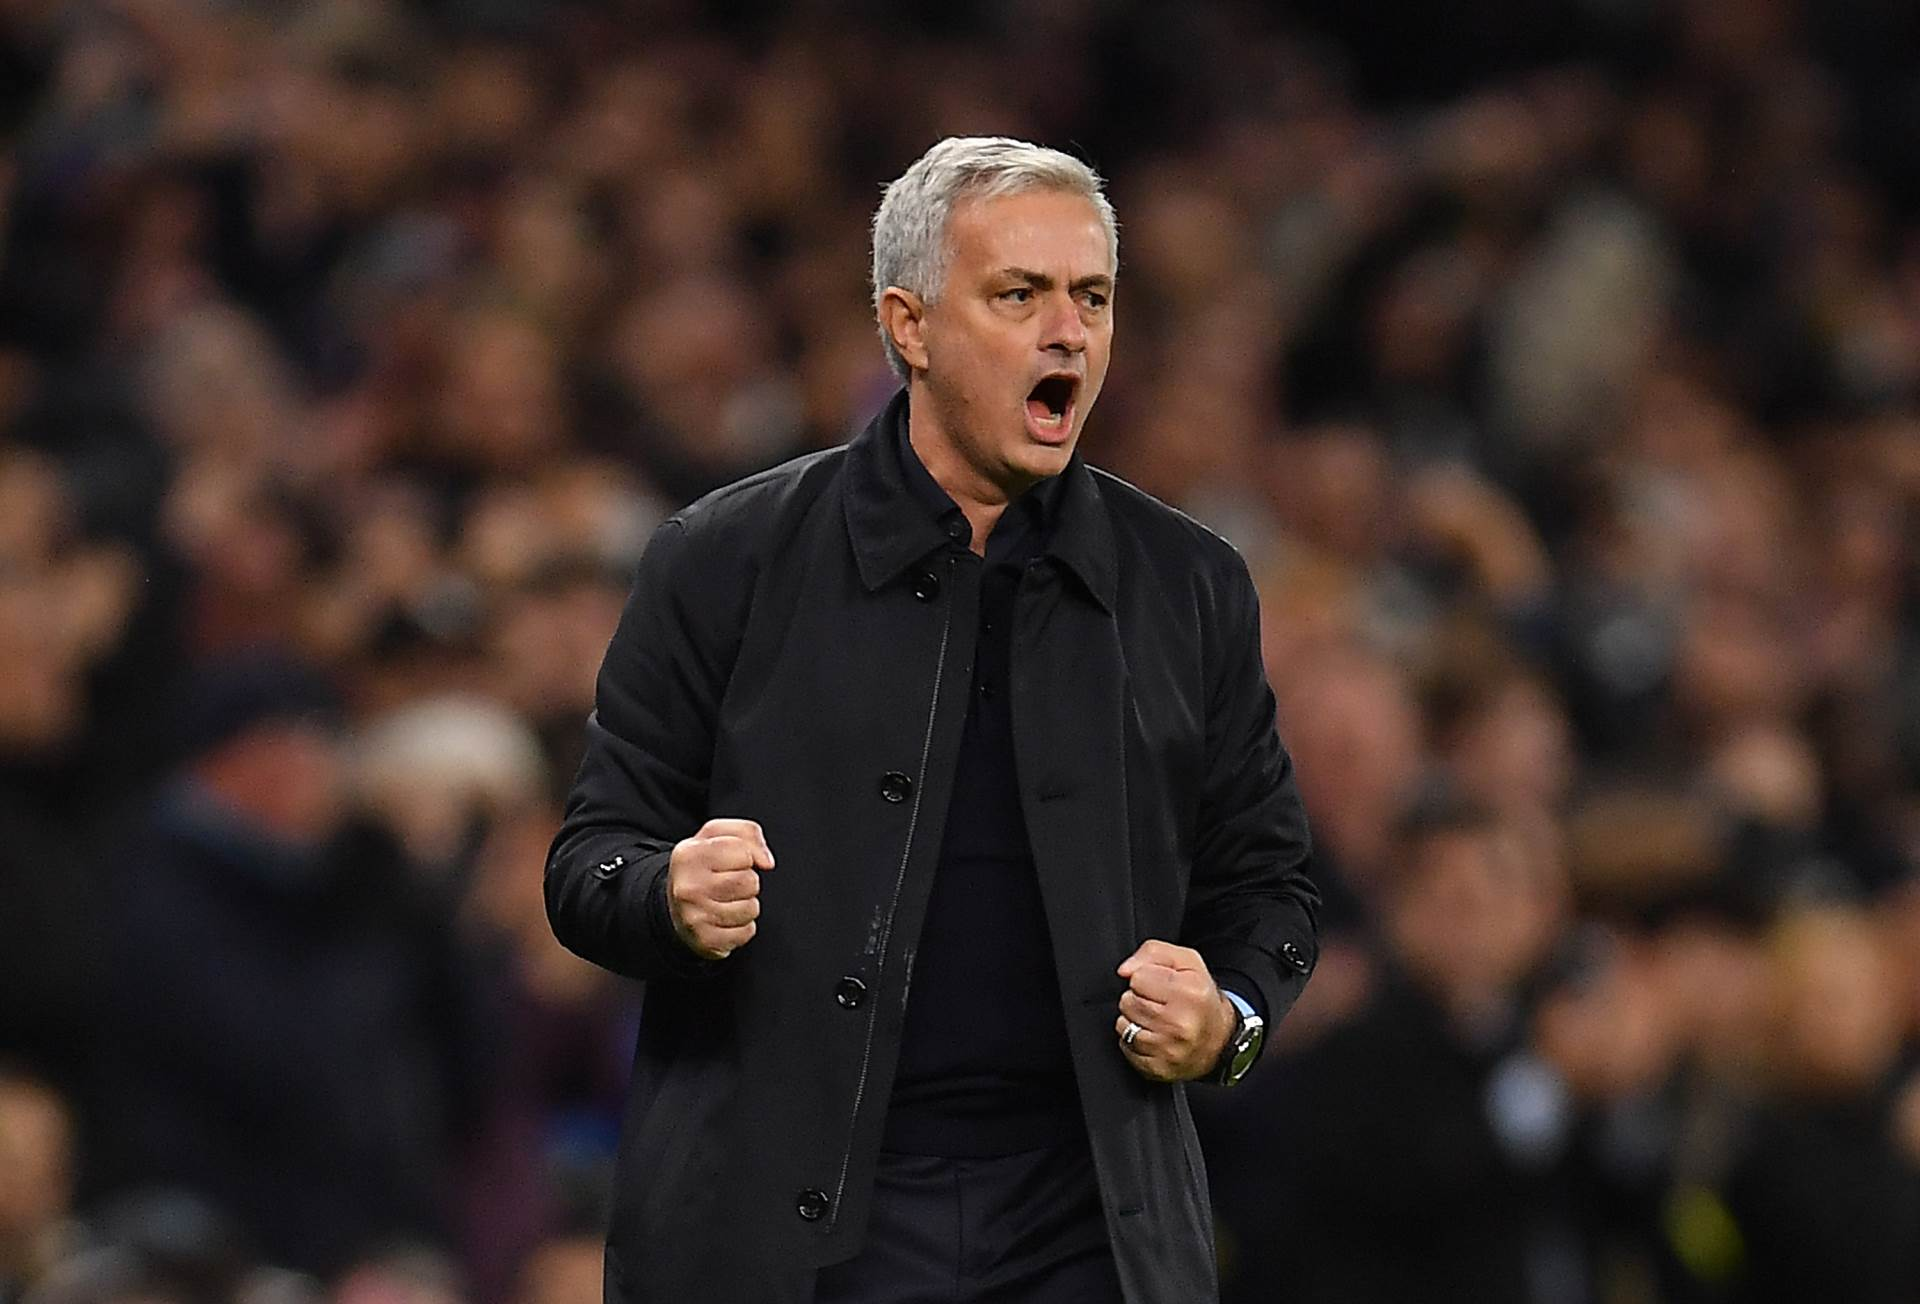 Roy Keane brutally trolls Jose Mourinho's Tottenham after Man Utd stun Man City - Bóng Đá